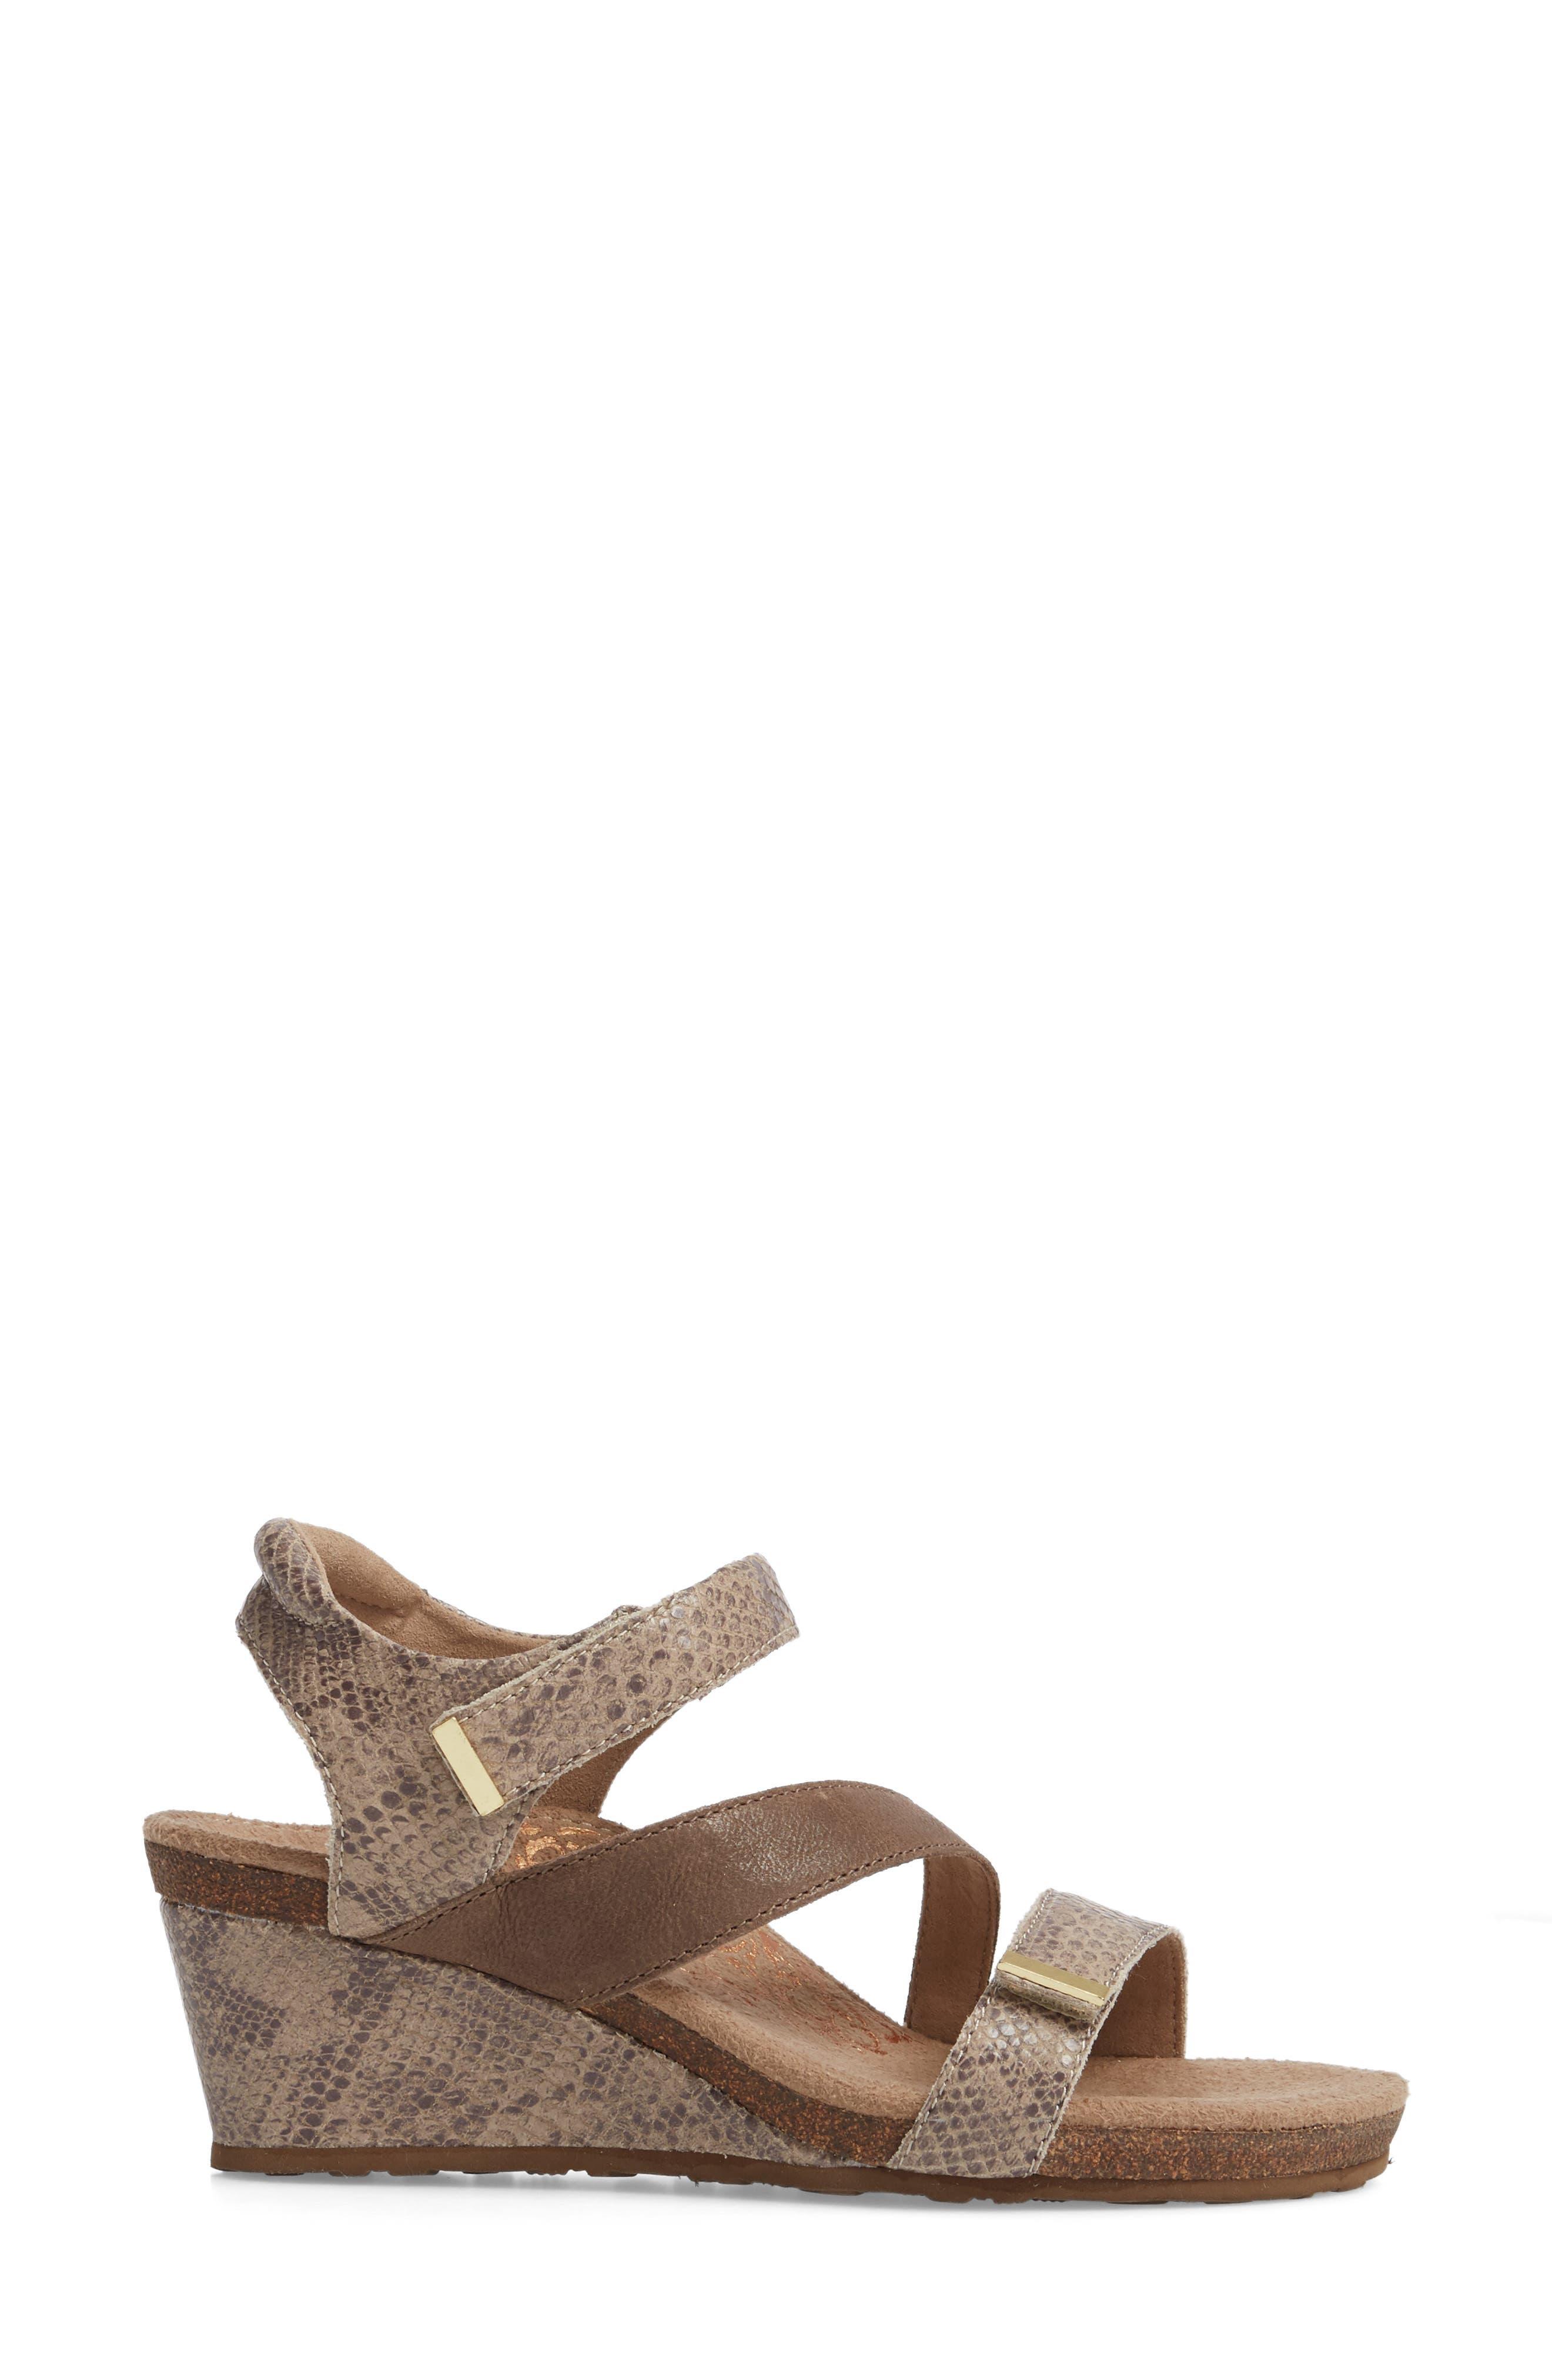 AETREX,                             Brynn Asymmetrical Wedge Sandal,                             Alternate thumbnail 3, color,                             STONE SNAKE LEATHER